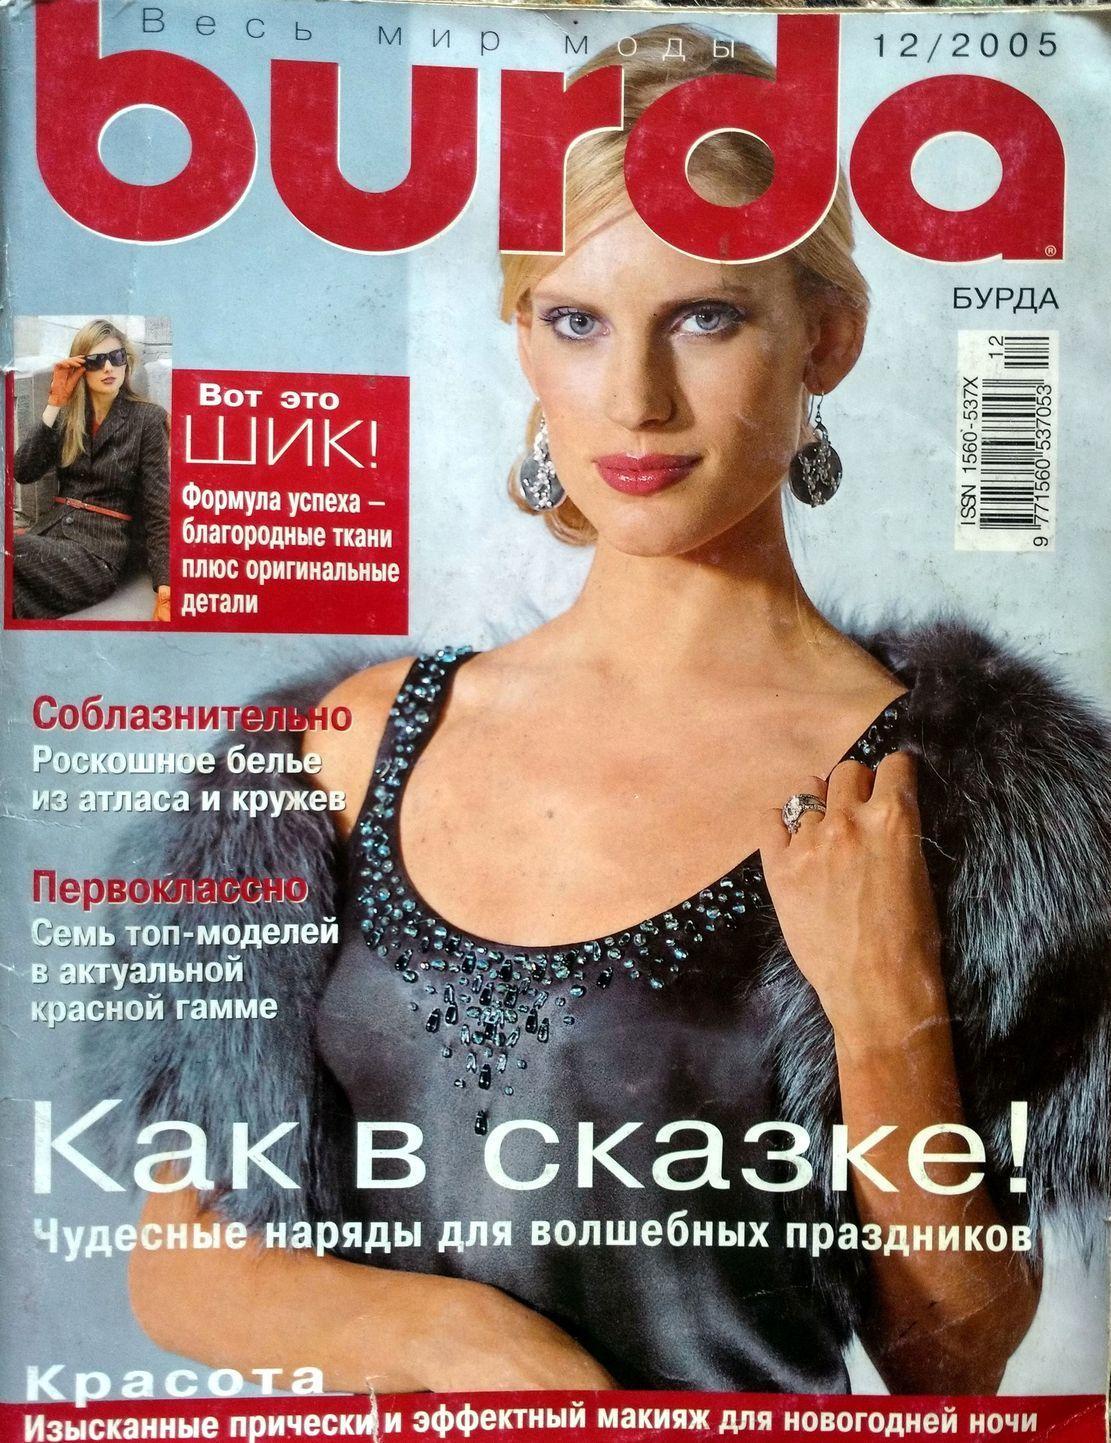 Burda Moden № 12/2005 – купить на Ярмарке Мастеров – J76F0RU | Материалы для творчества, Москва